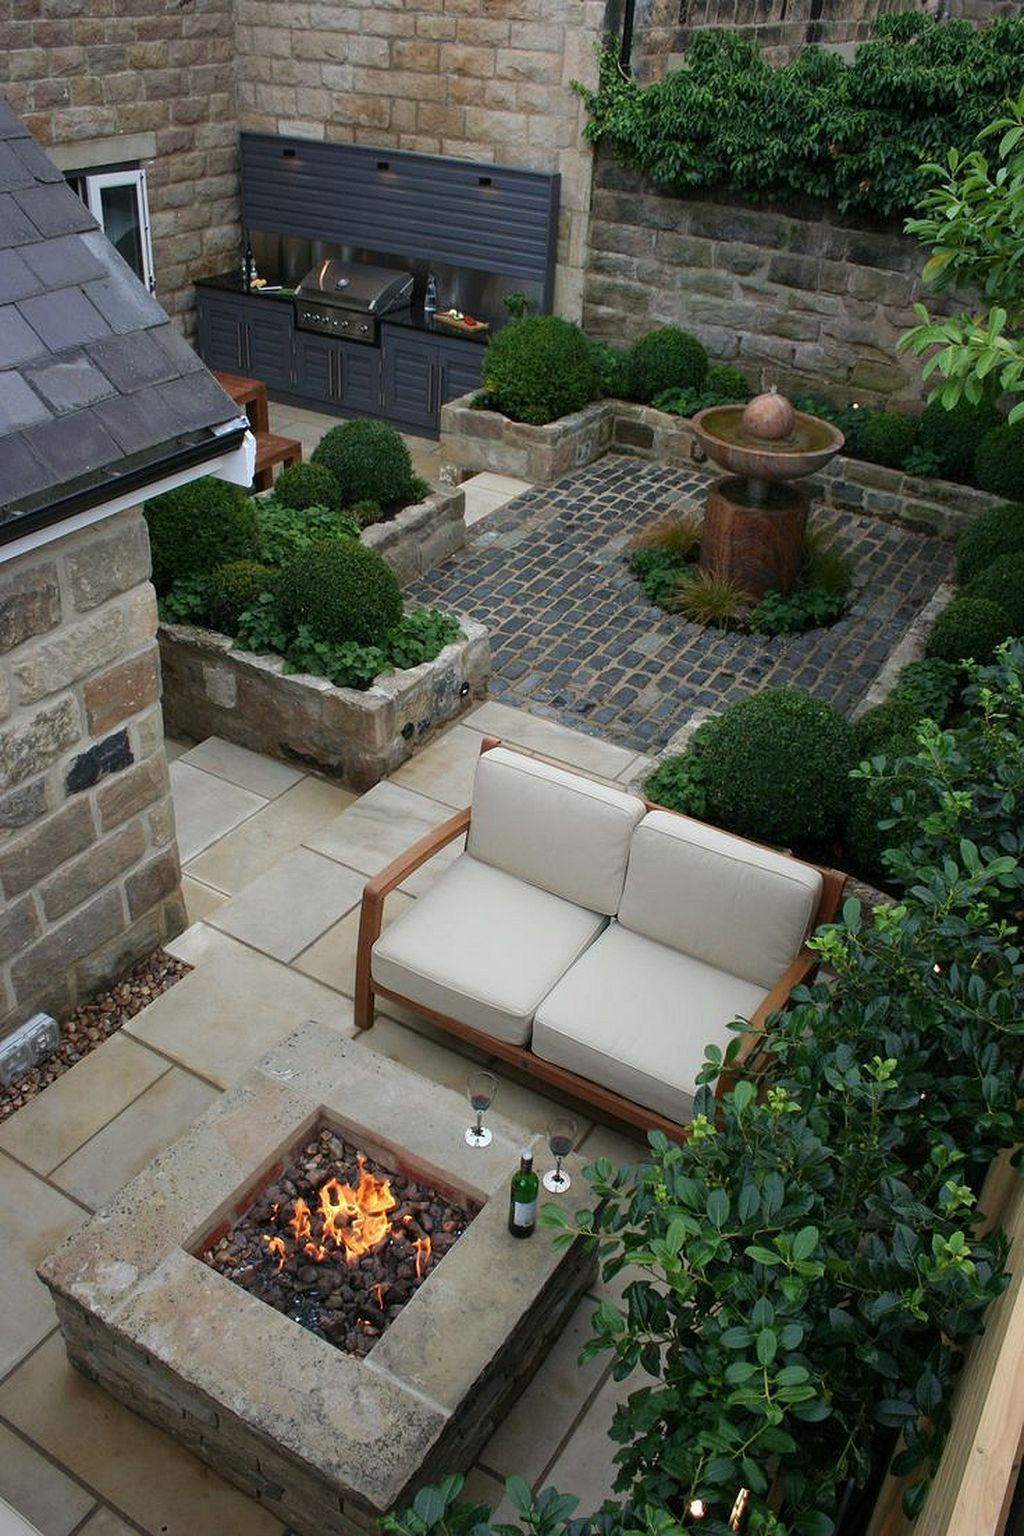 Amazing Modern Rock Garden Ideas For Backyard (32) | Gartenideen und ...